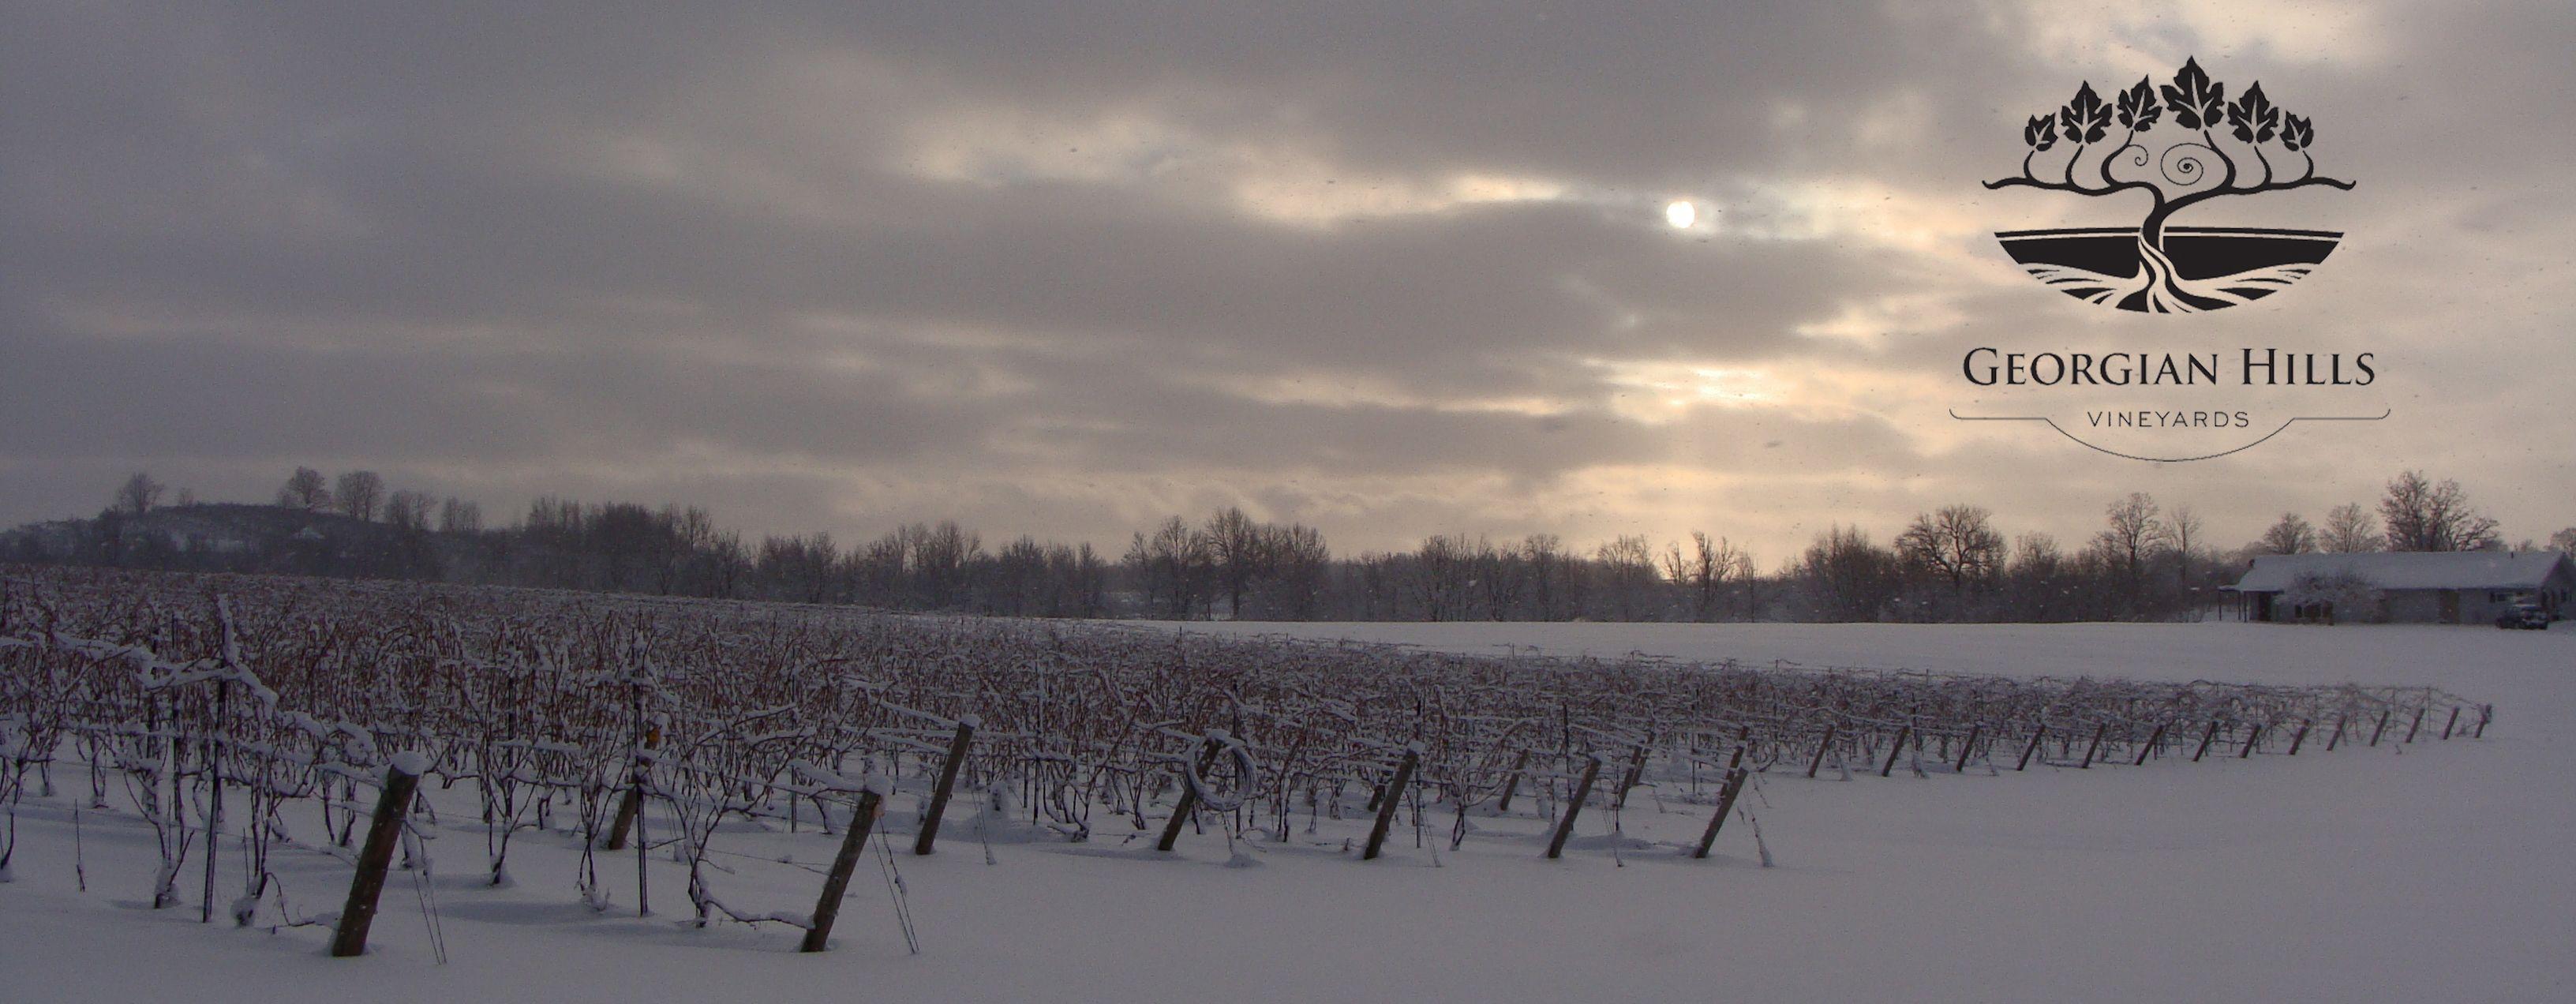 http://www.georgianhillsvineyards.ca/wp-content/uploads/2013/01/GHV-winter-landscape-with-logo.jpg